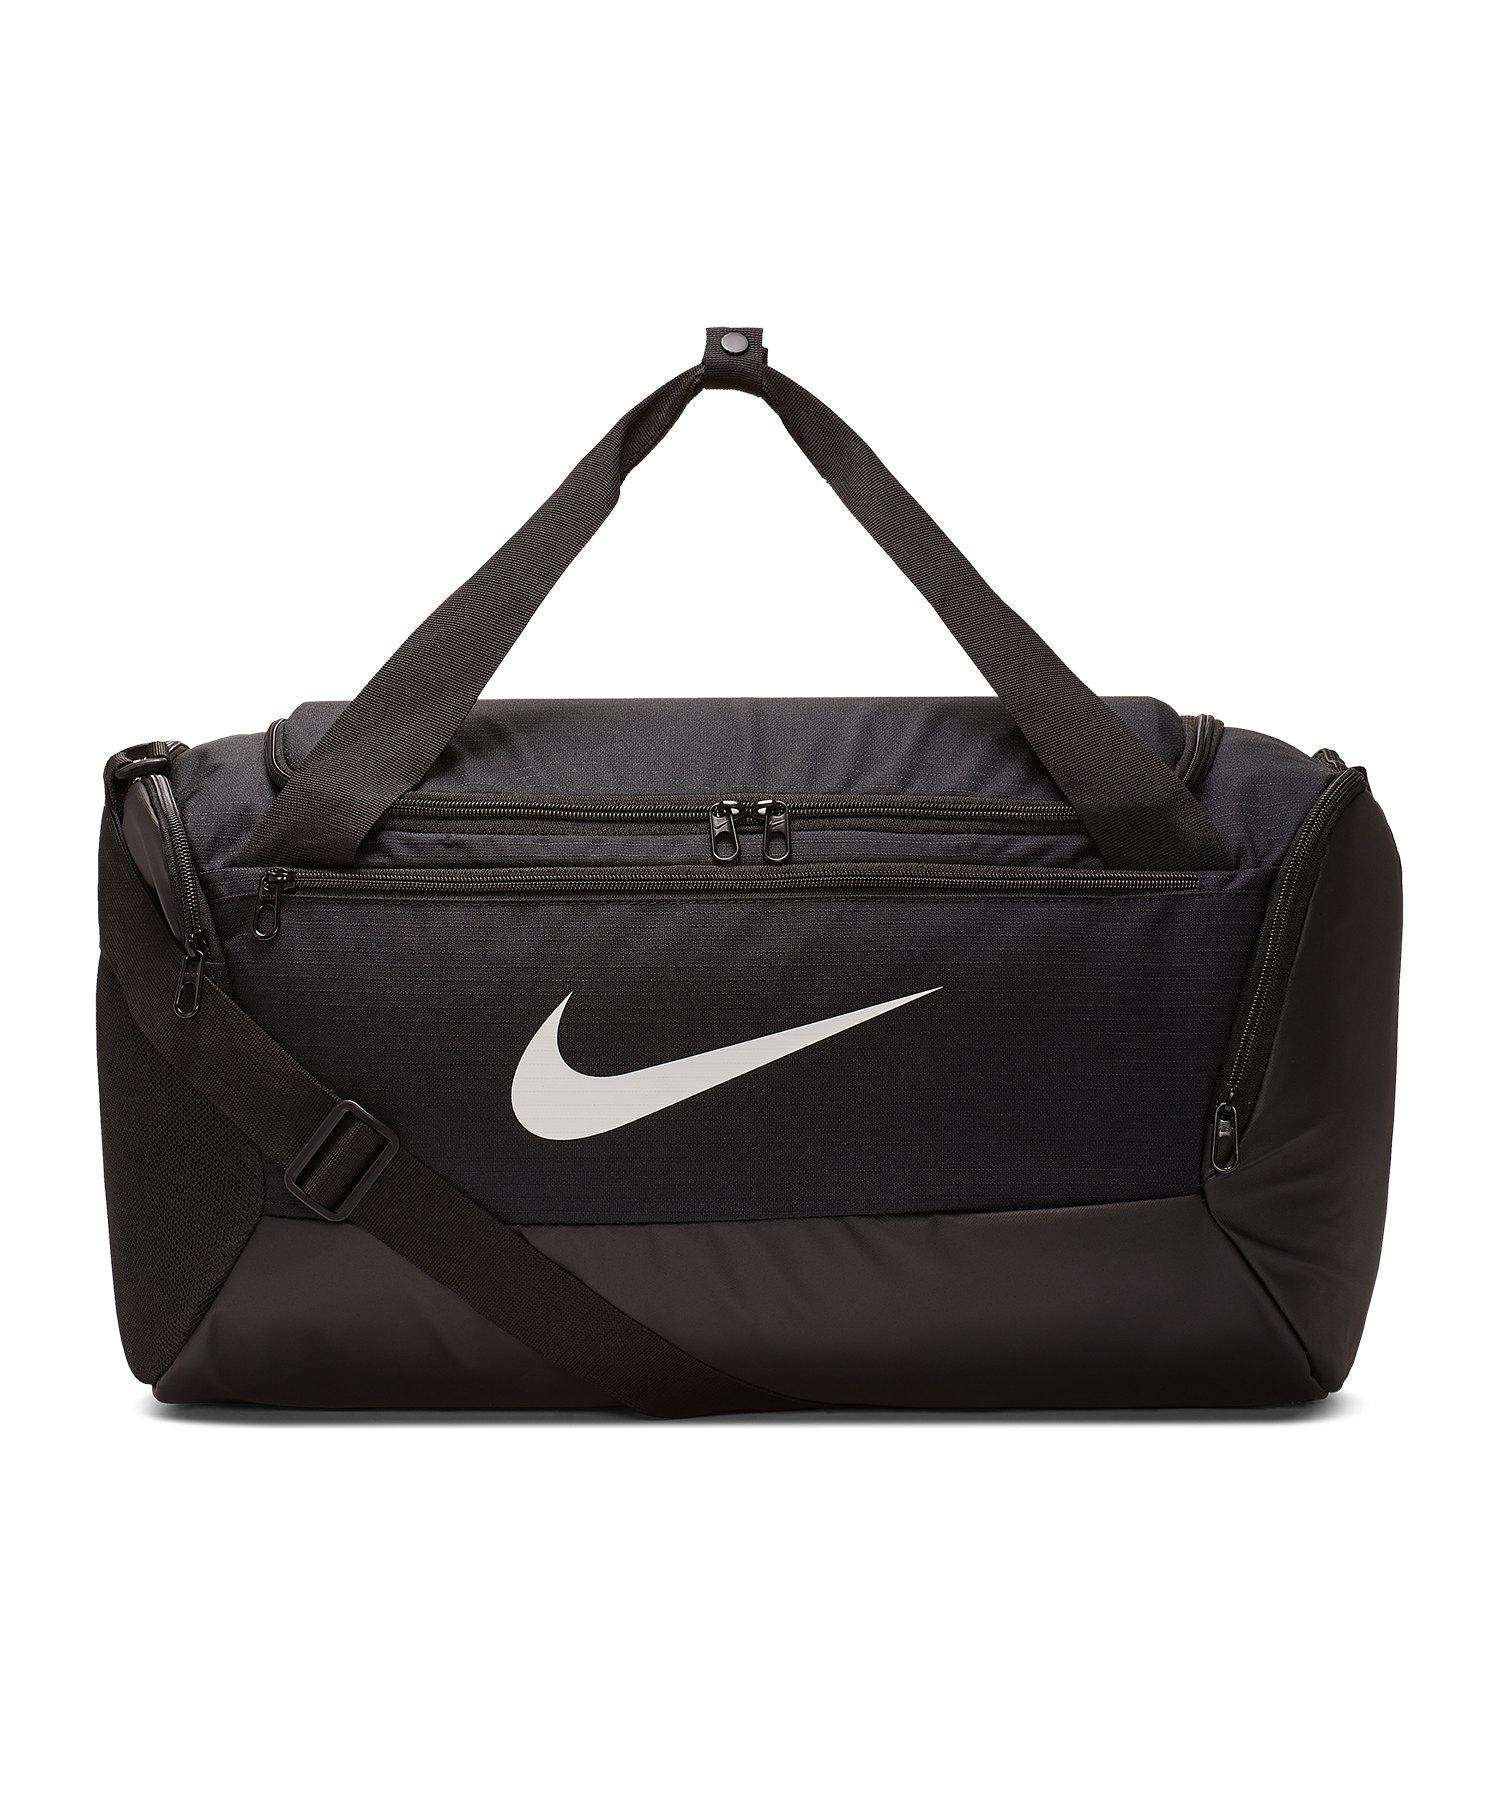 Nike Brasilia Duffel Bag Tasche Small Schwarz F010 - schwarz